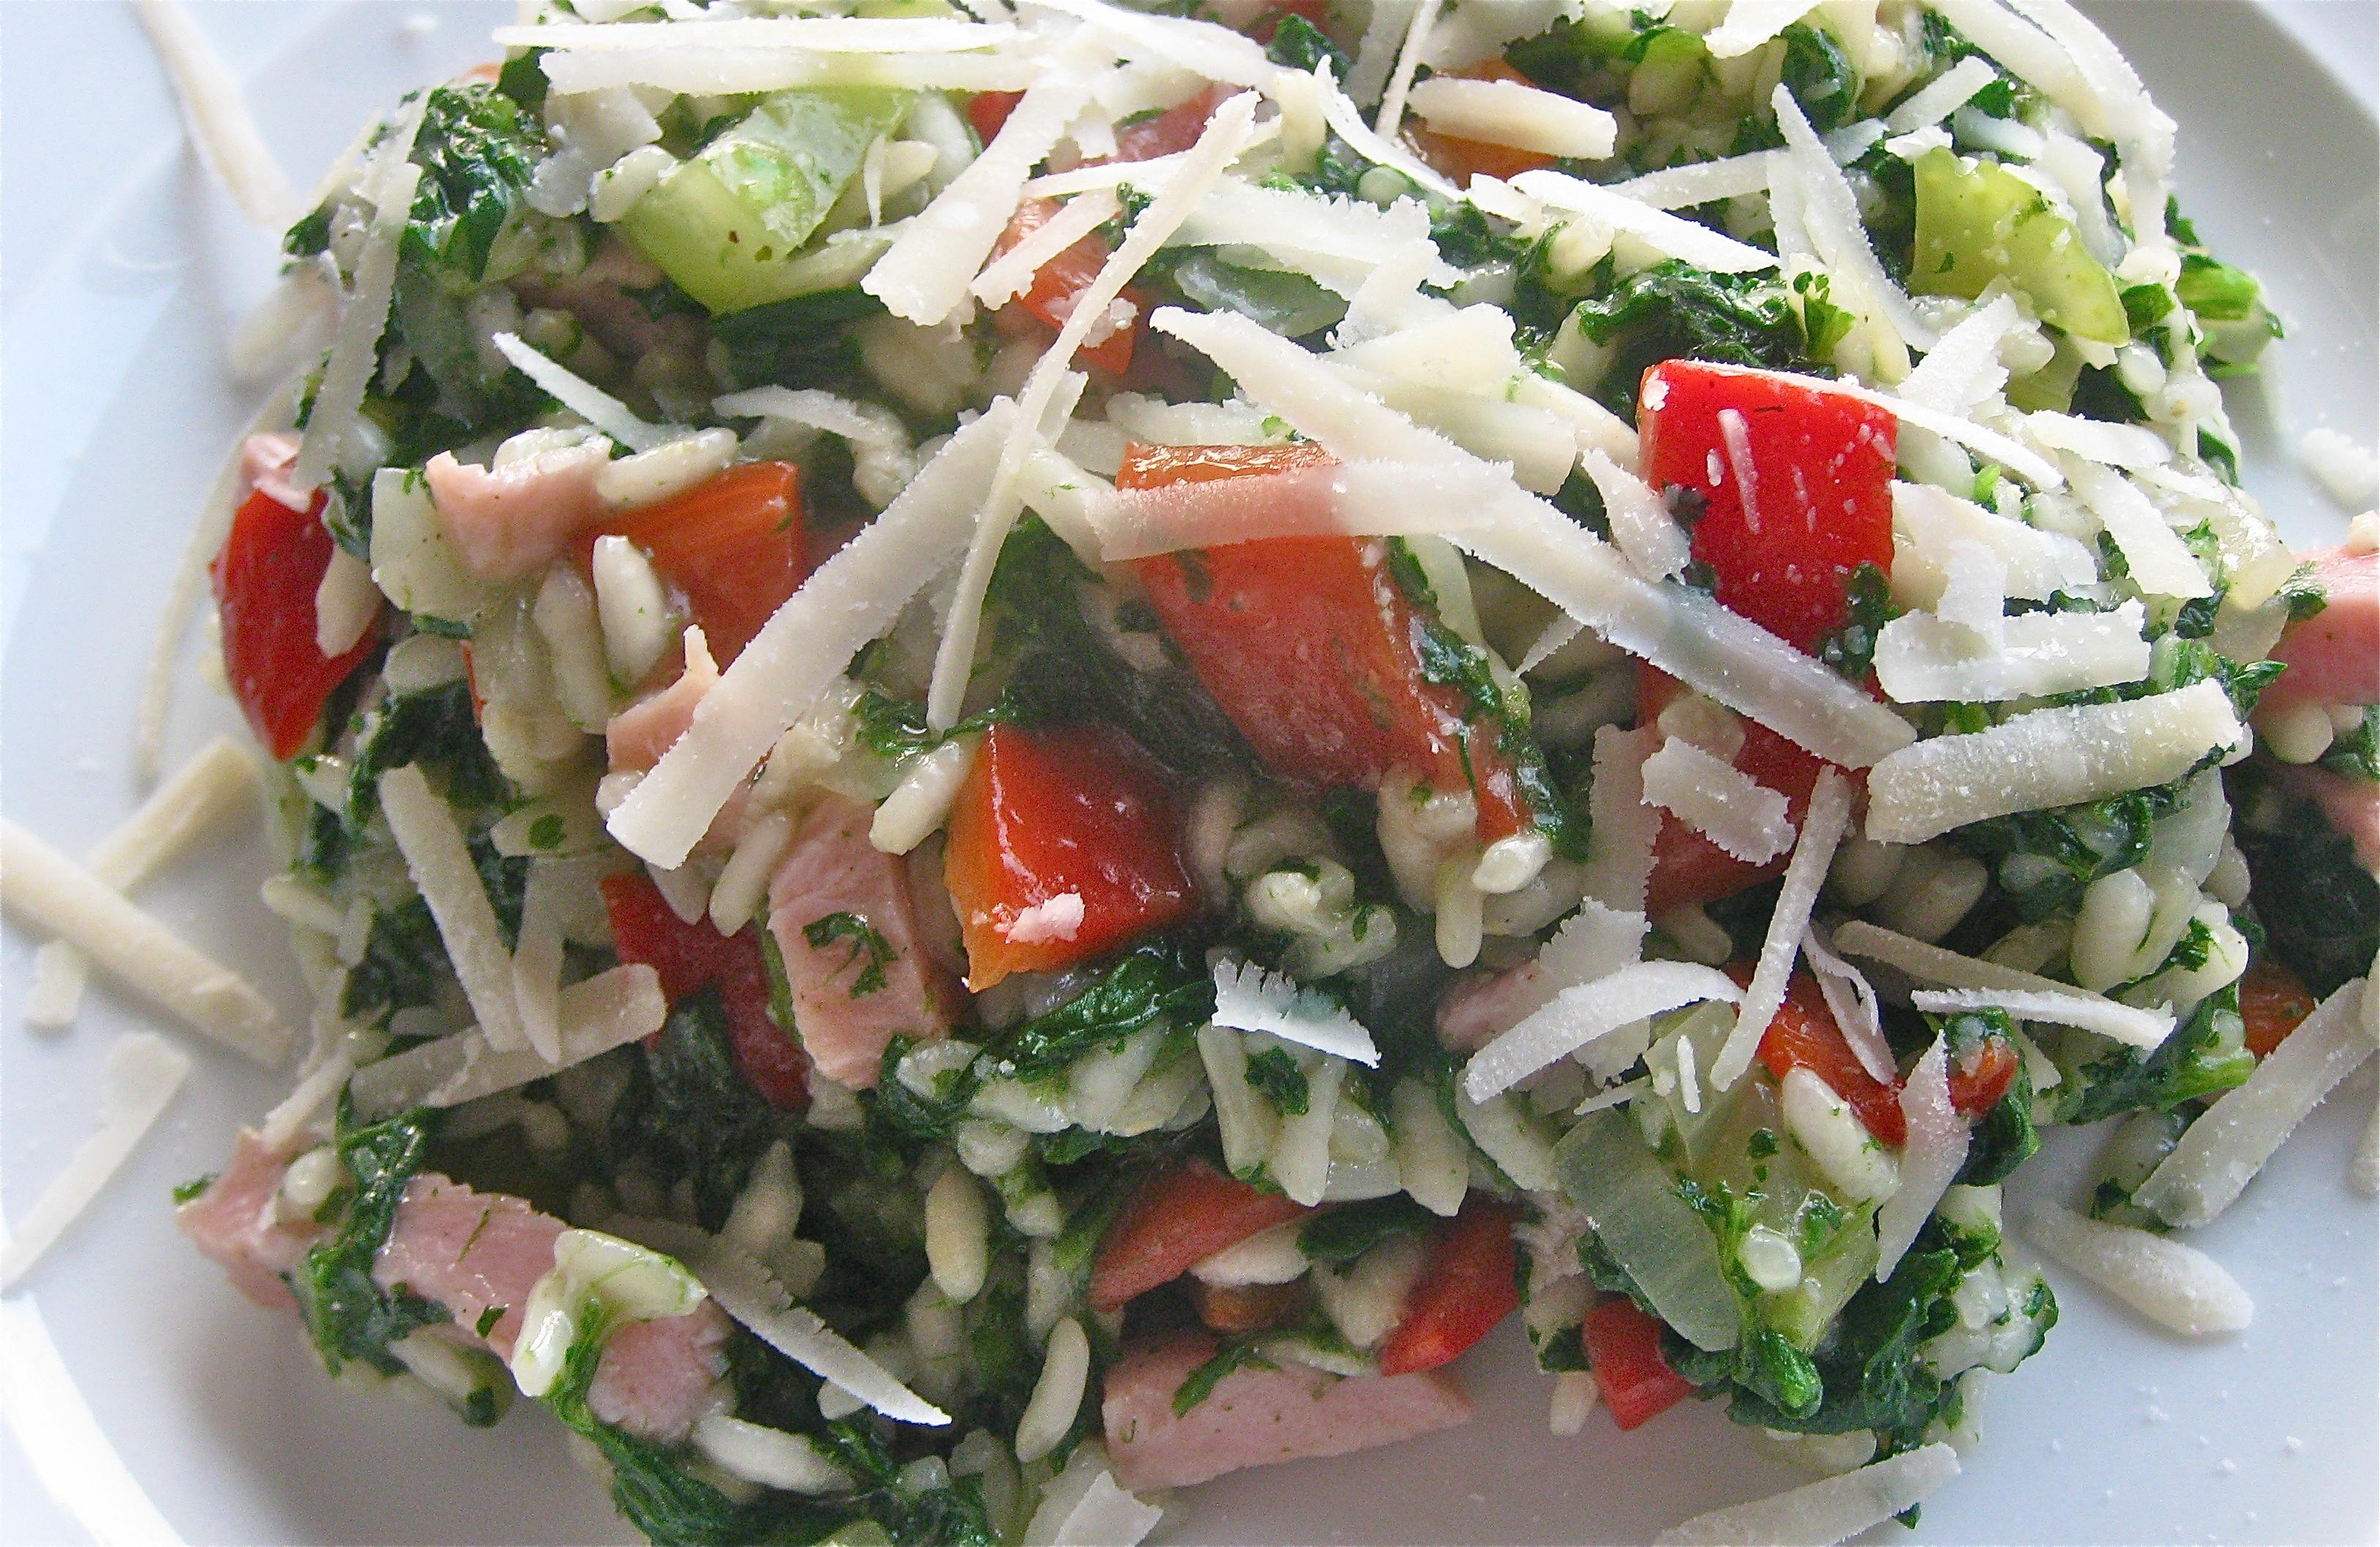 risotto met rood en groen: paprika en spinazie.